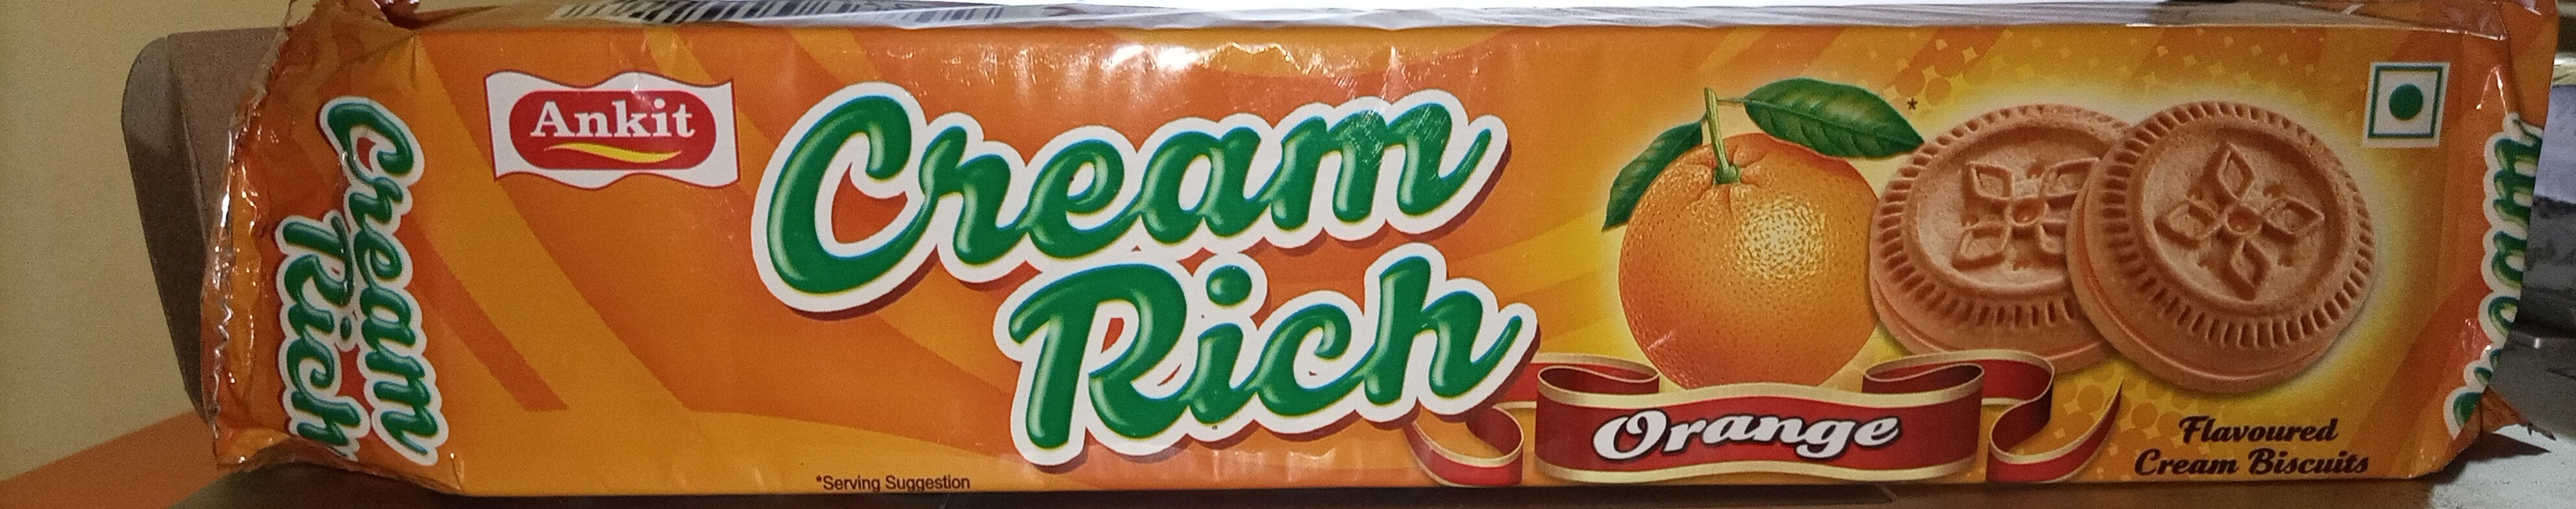 Cream Rich Orange - Product - fr